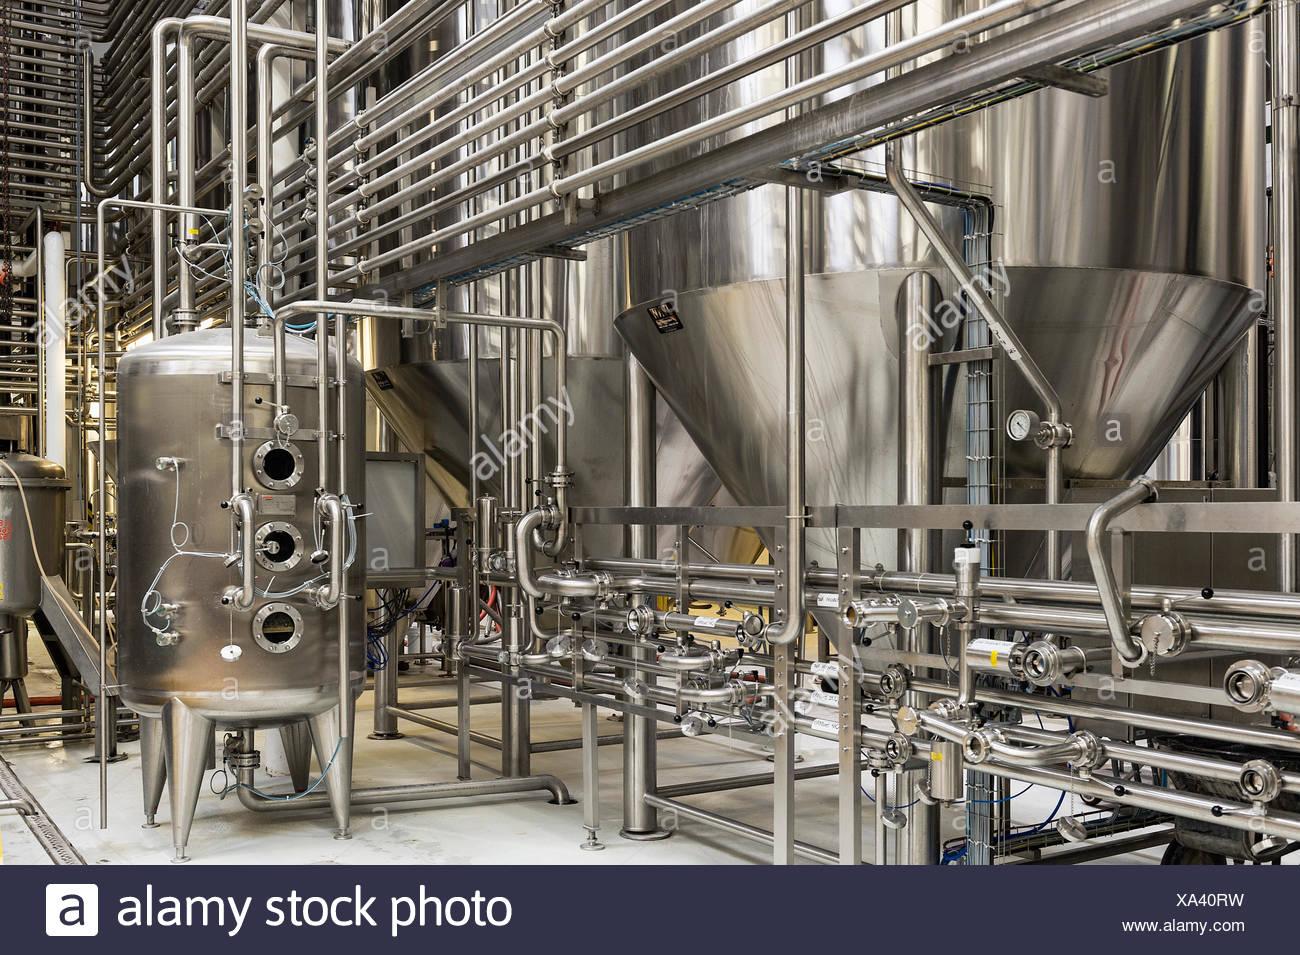 Brewery fermentation tanks. - Stock Image